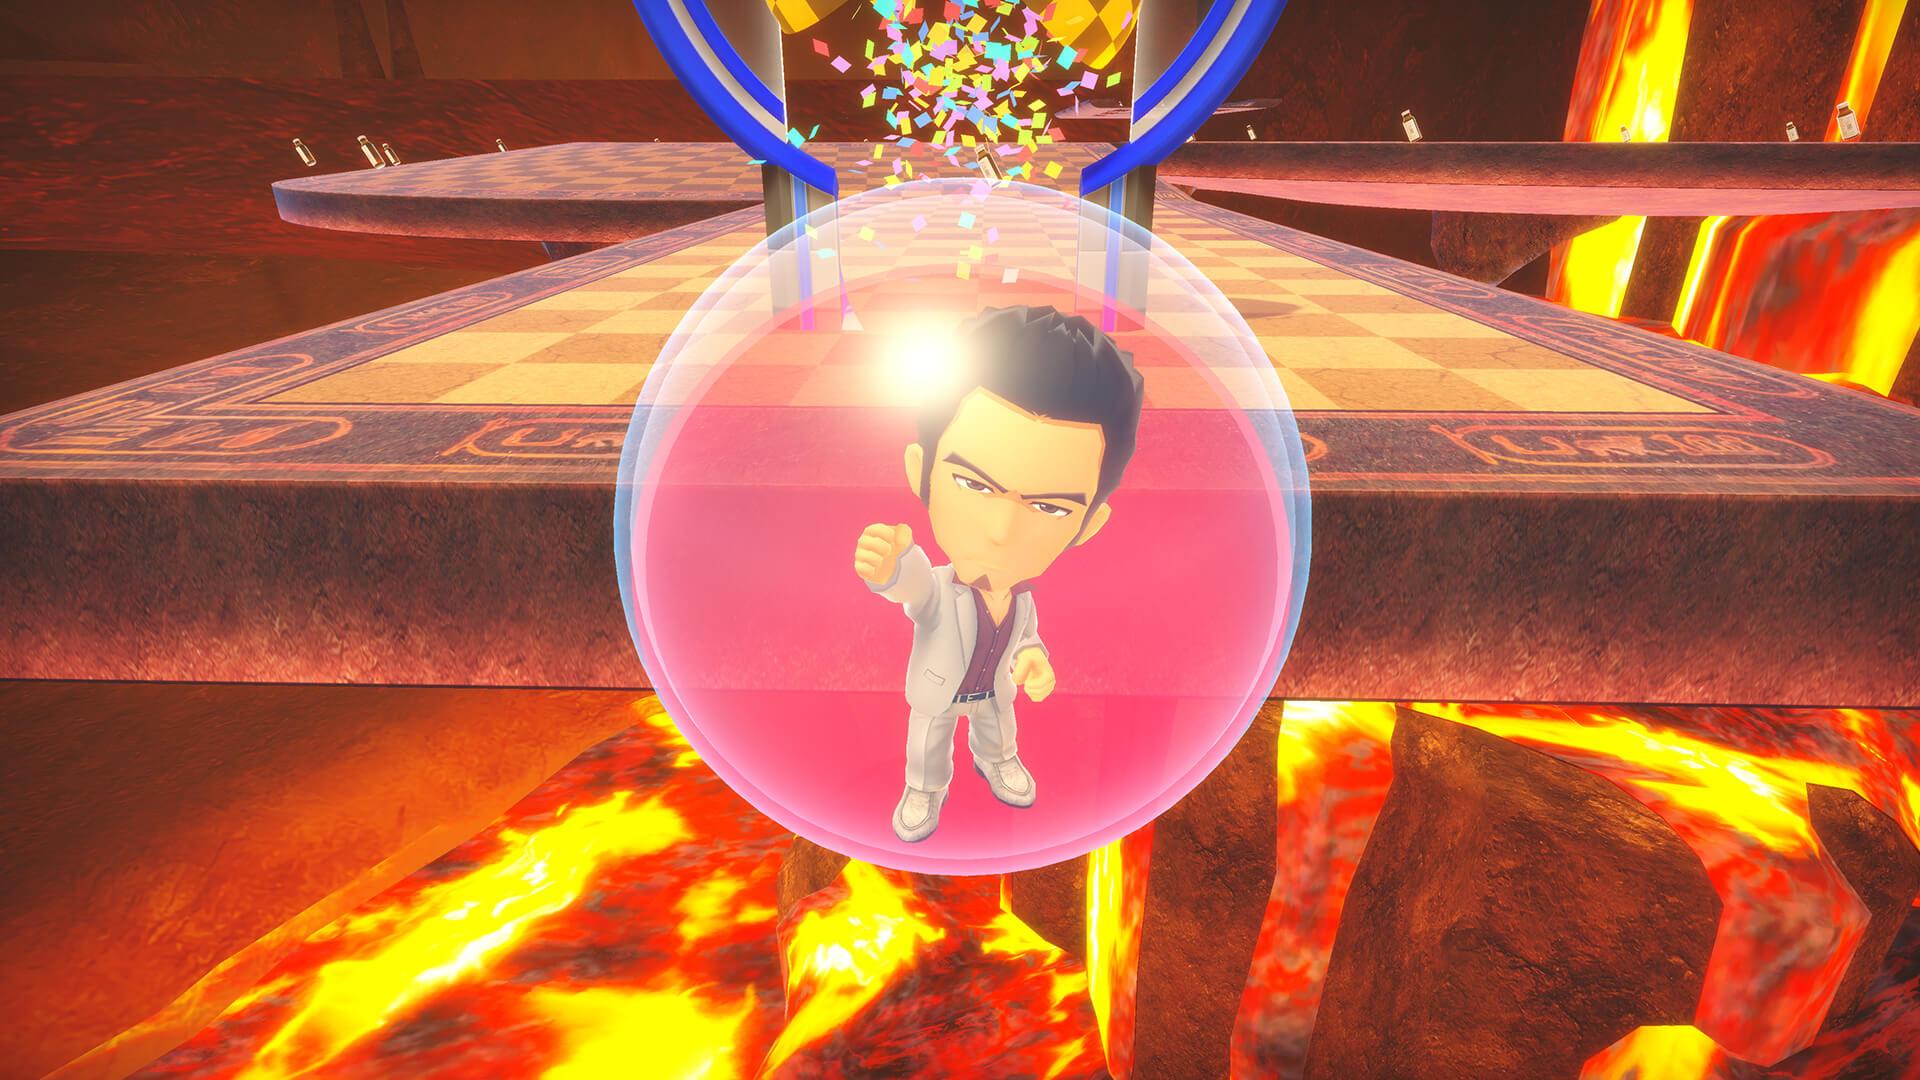 Yakuza's Kazuma Kiryu is indeed trapped inside a Super Monkey Ball